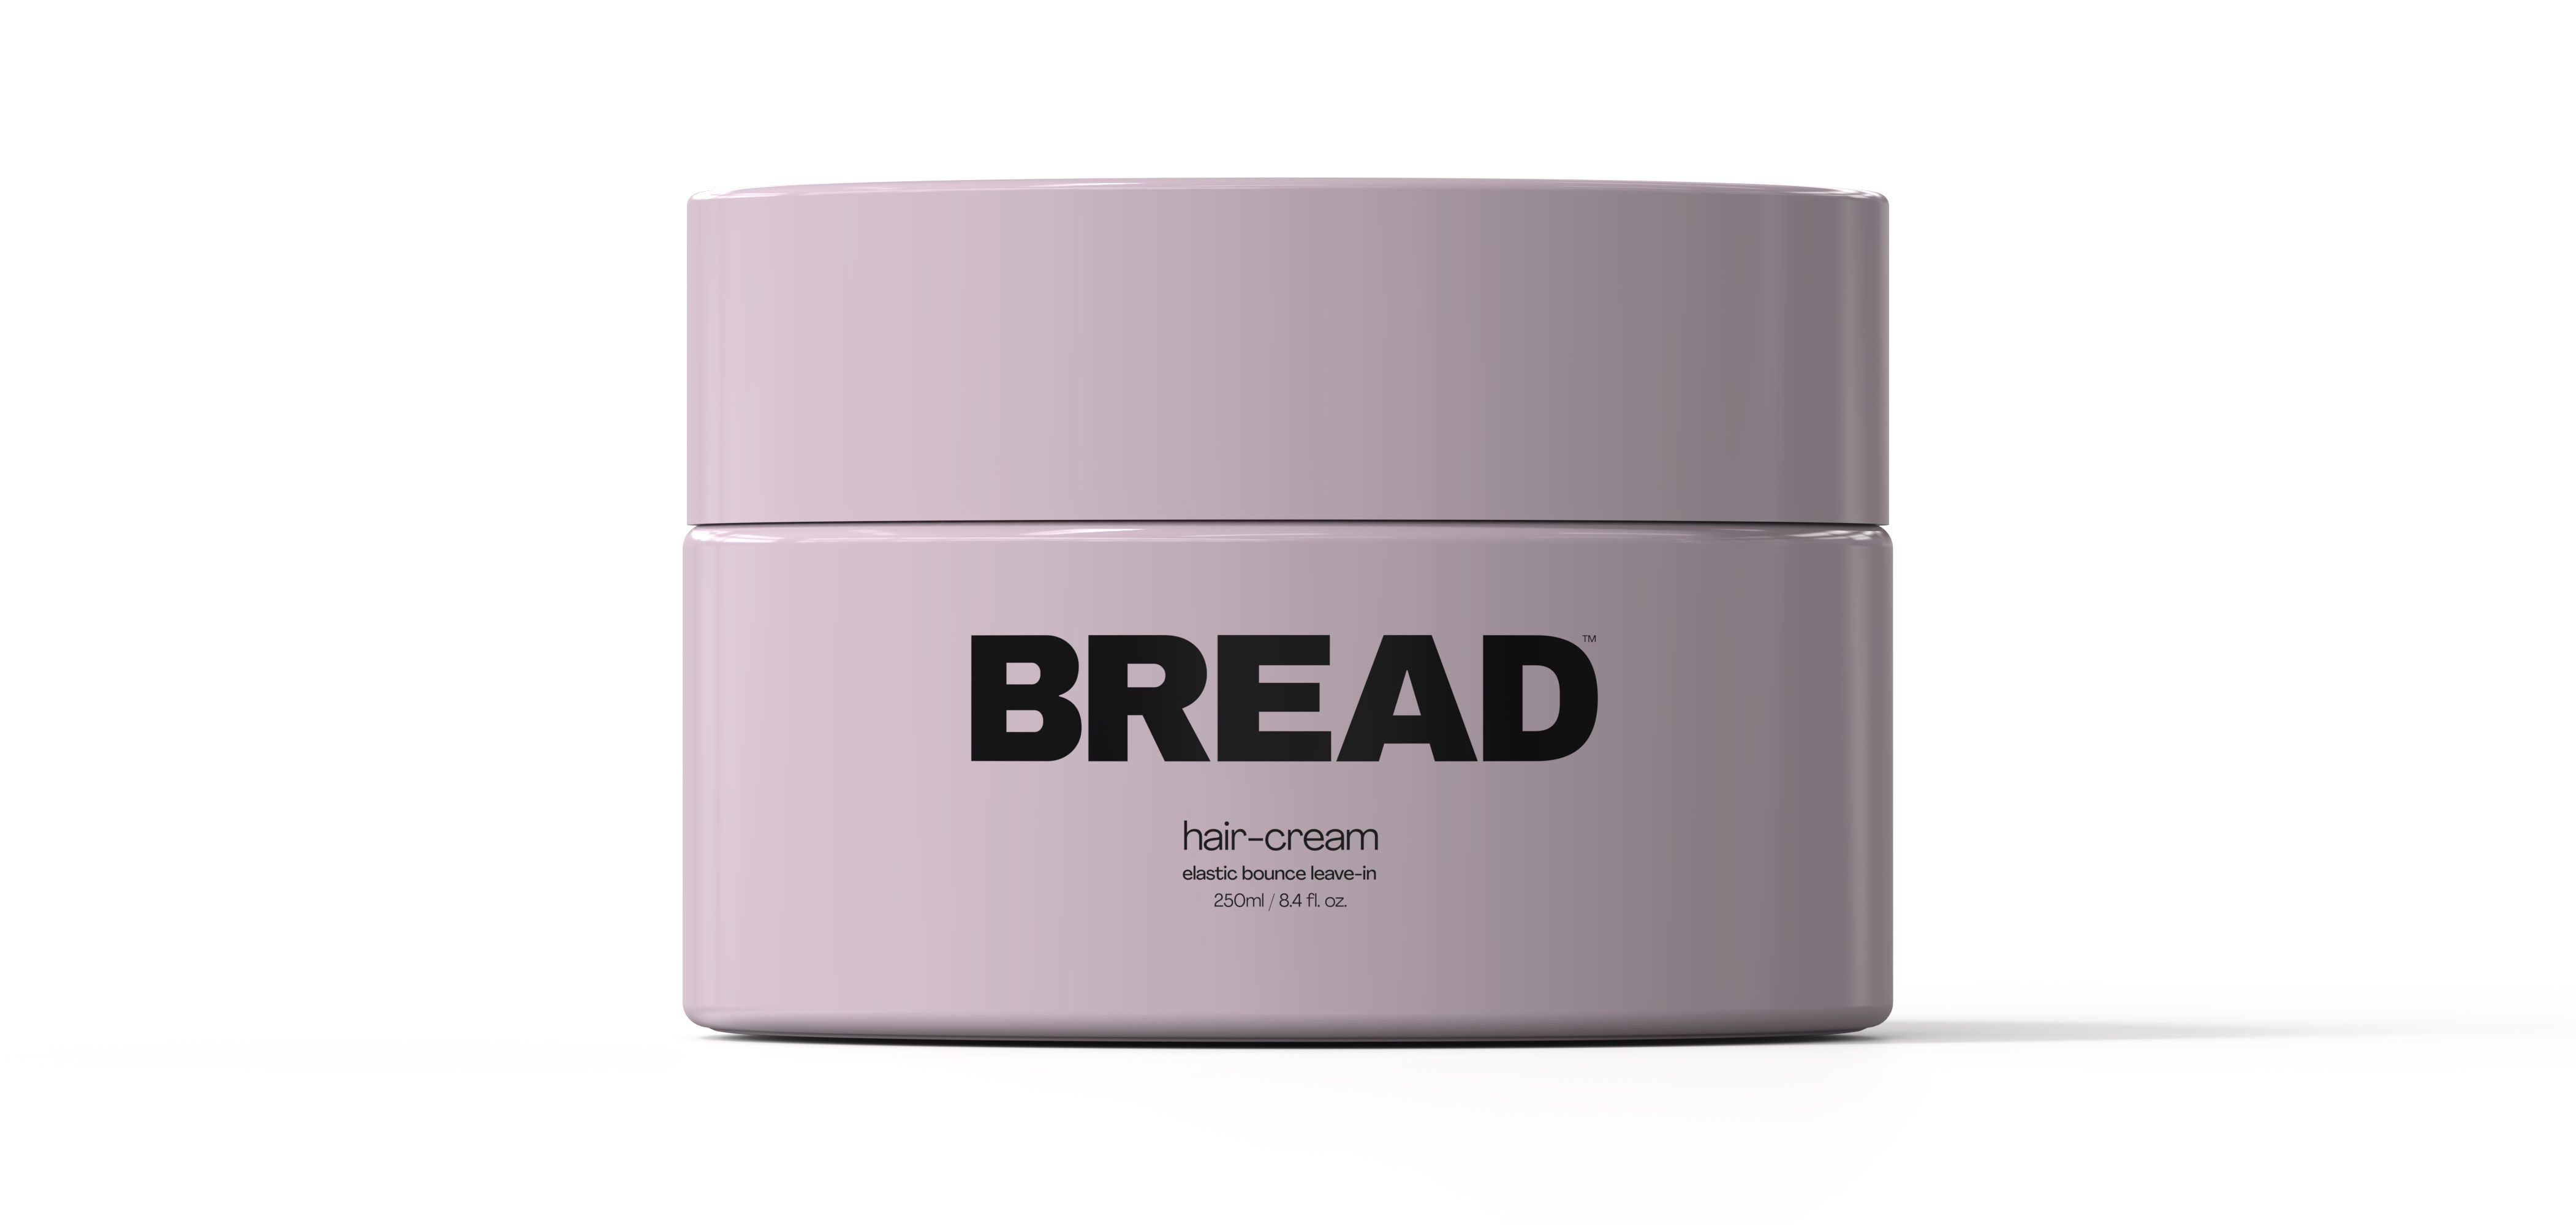 Bread Beauty Supply Hair-Cream